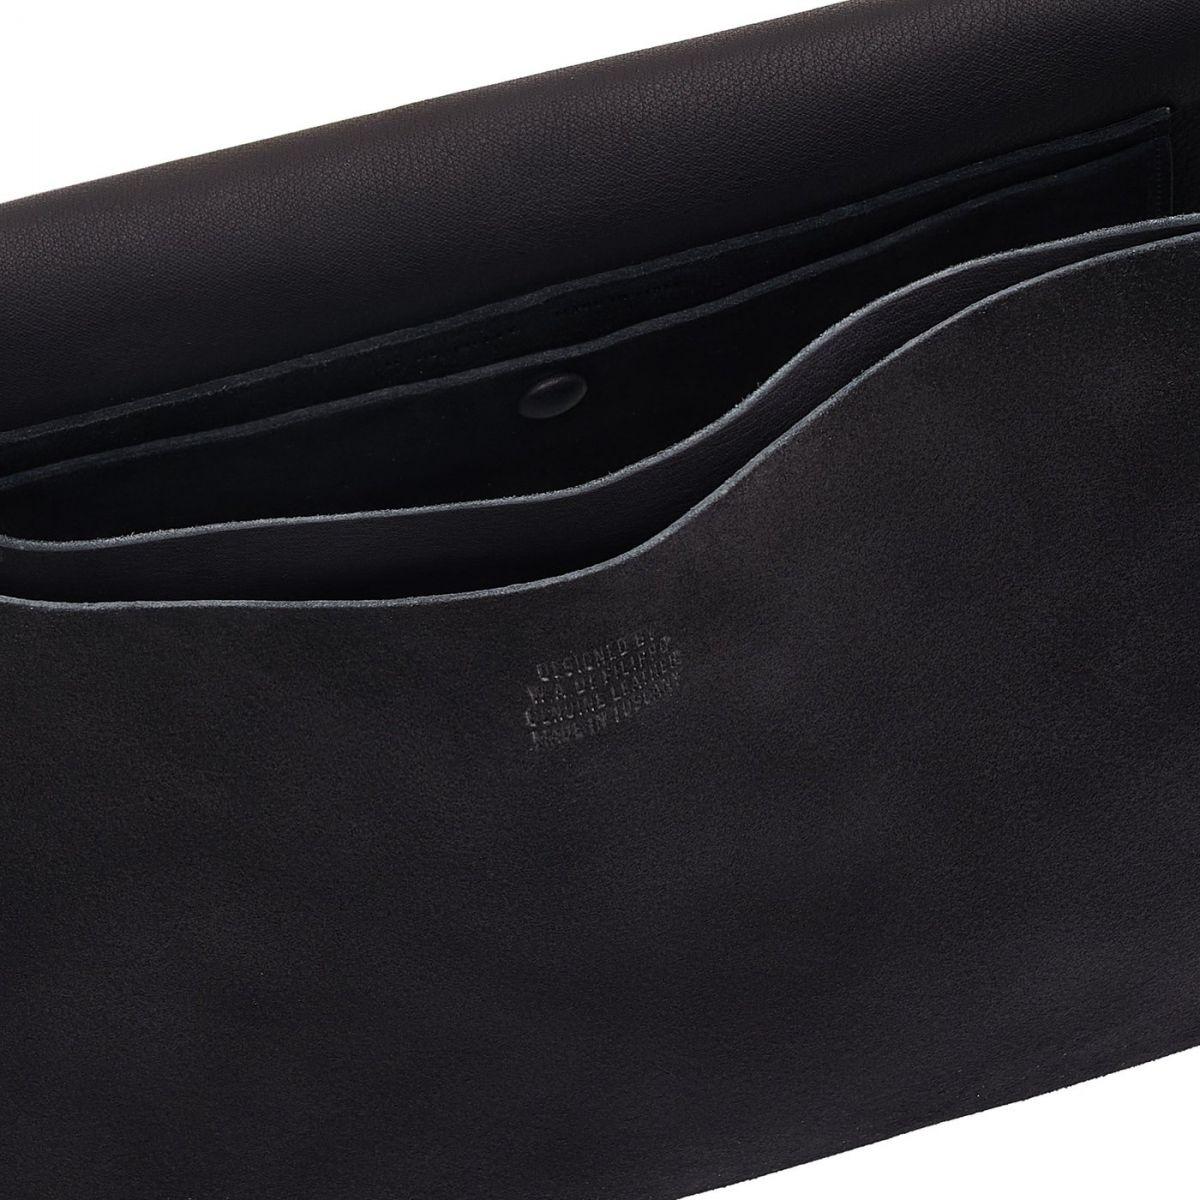 Lucrezia - Women's Shoulder Bag in Reversed Suede color Black - Tondina line BSH148 | Details